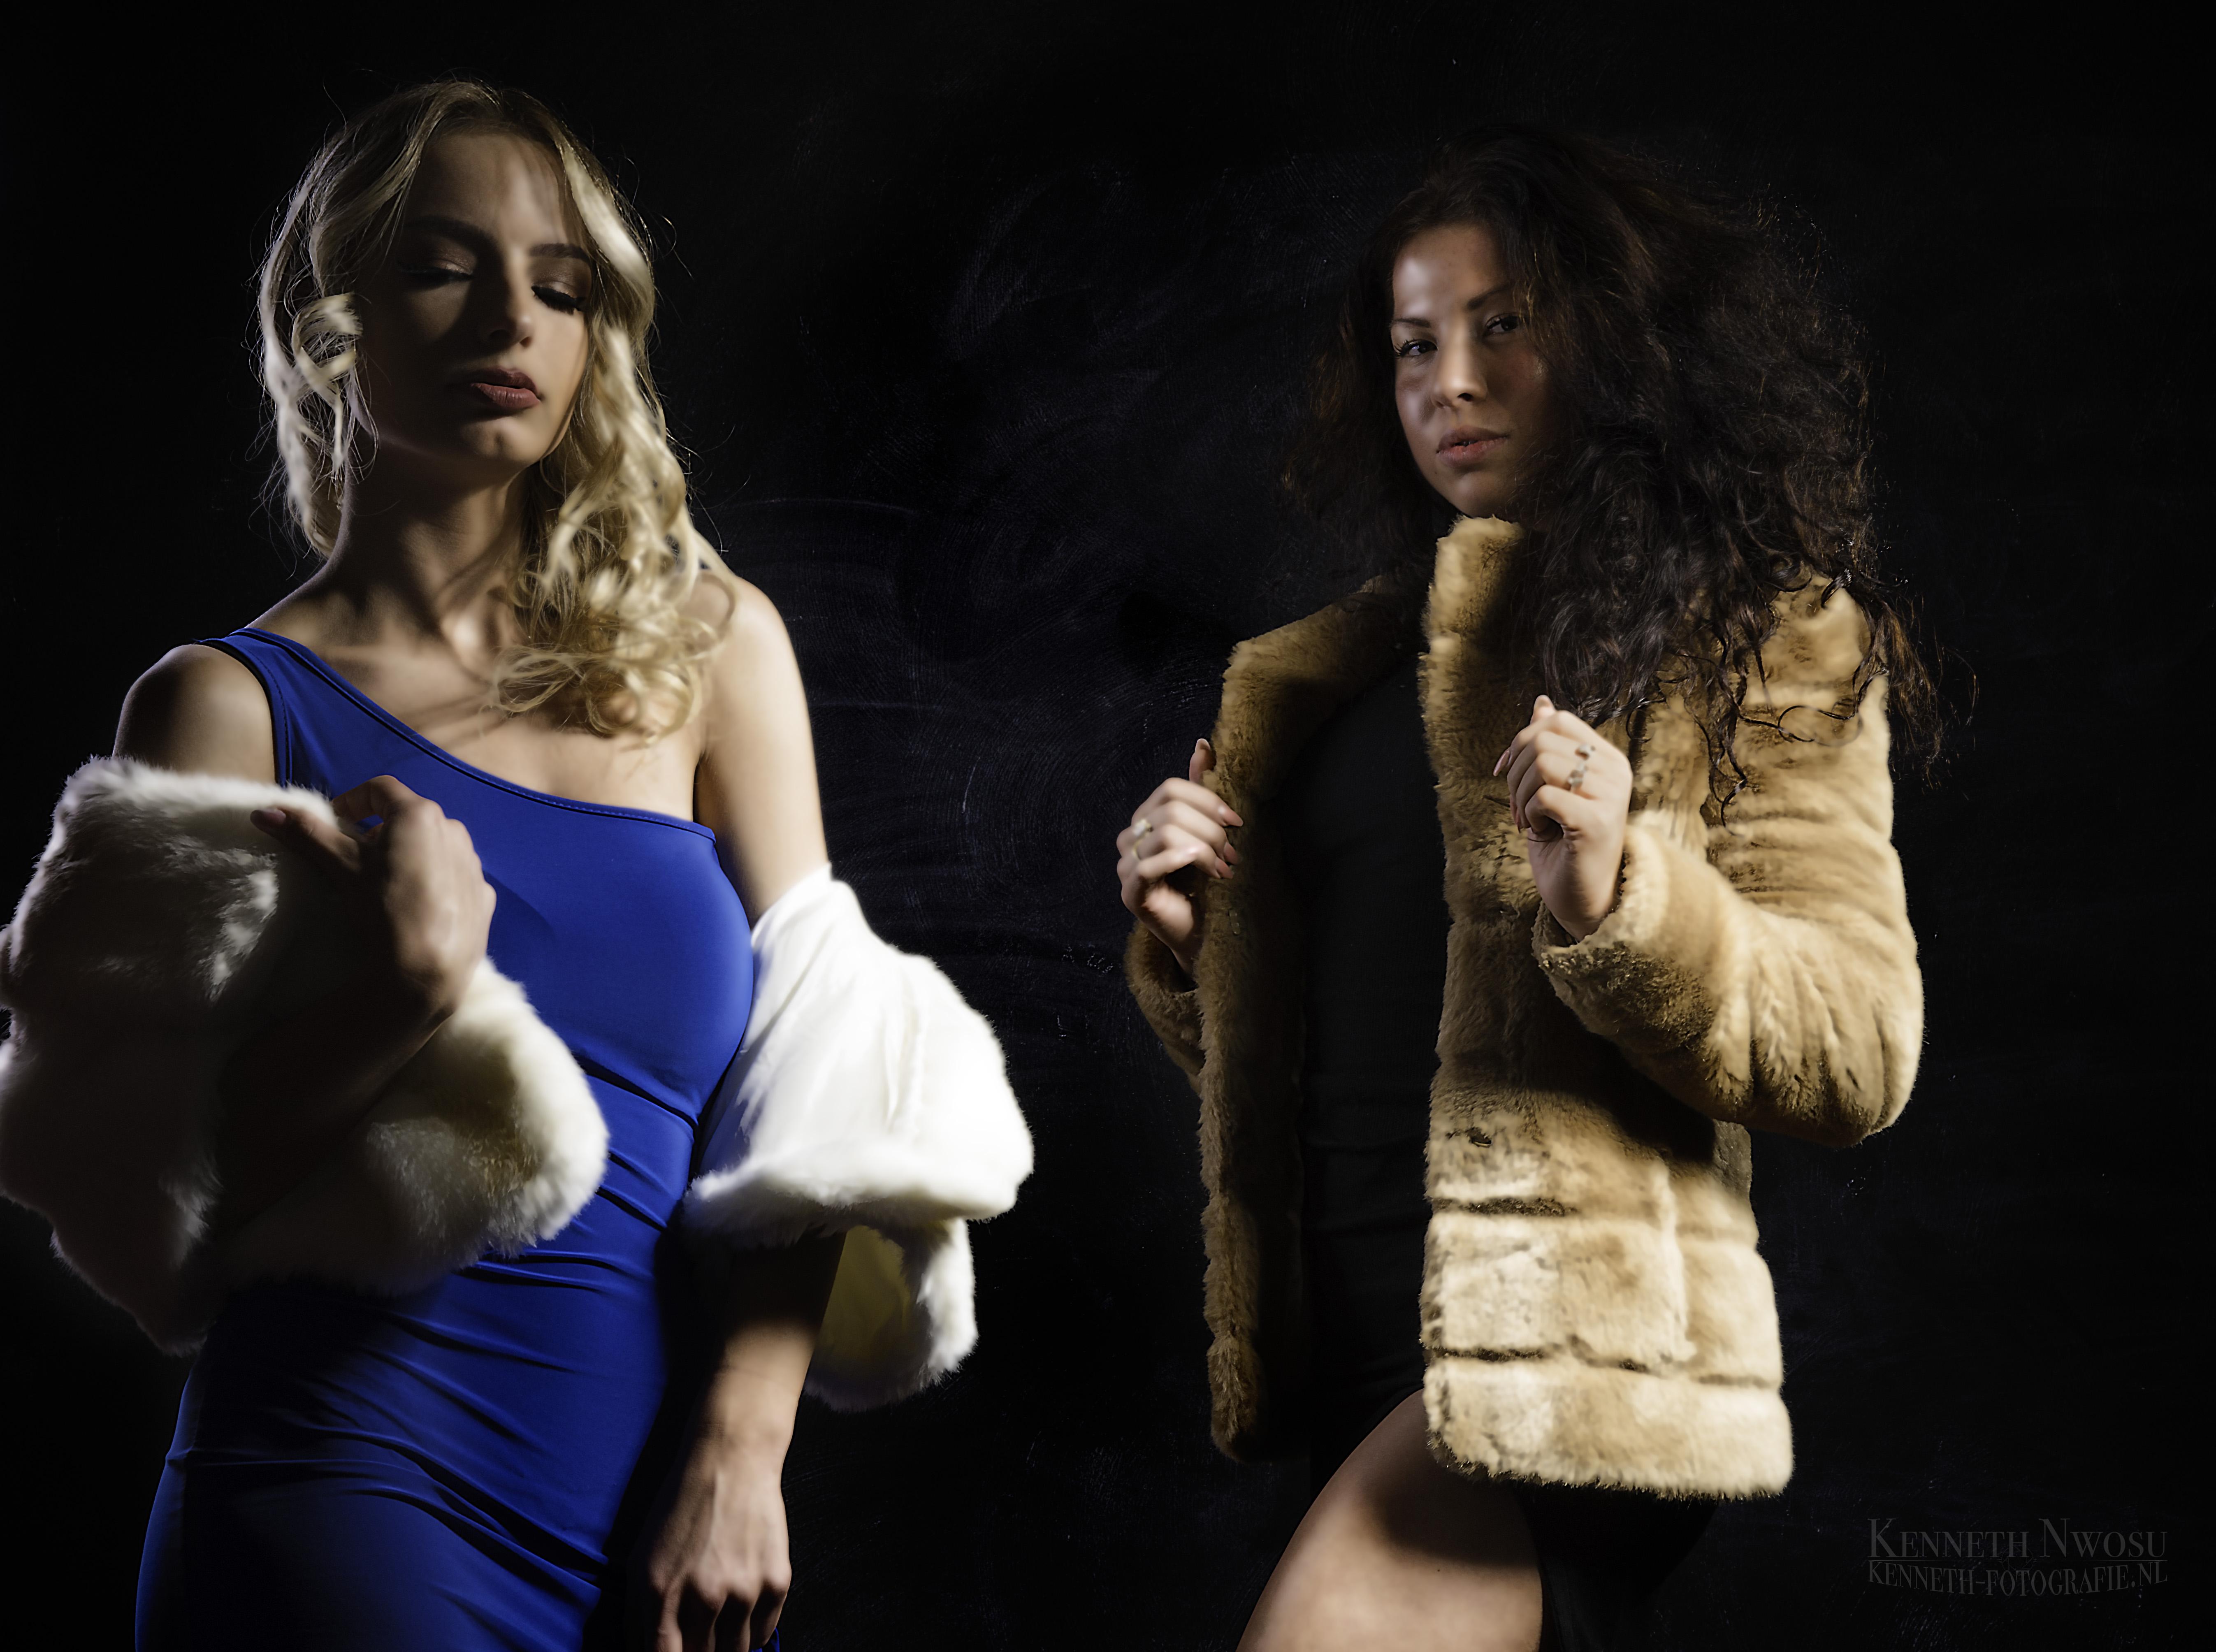 Fashion photoshoot met Amy en Liselotte